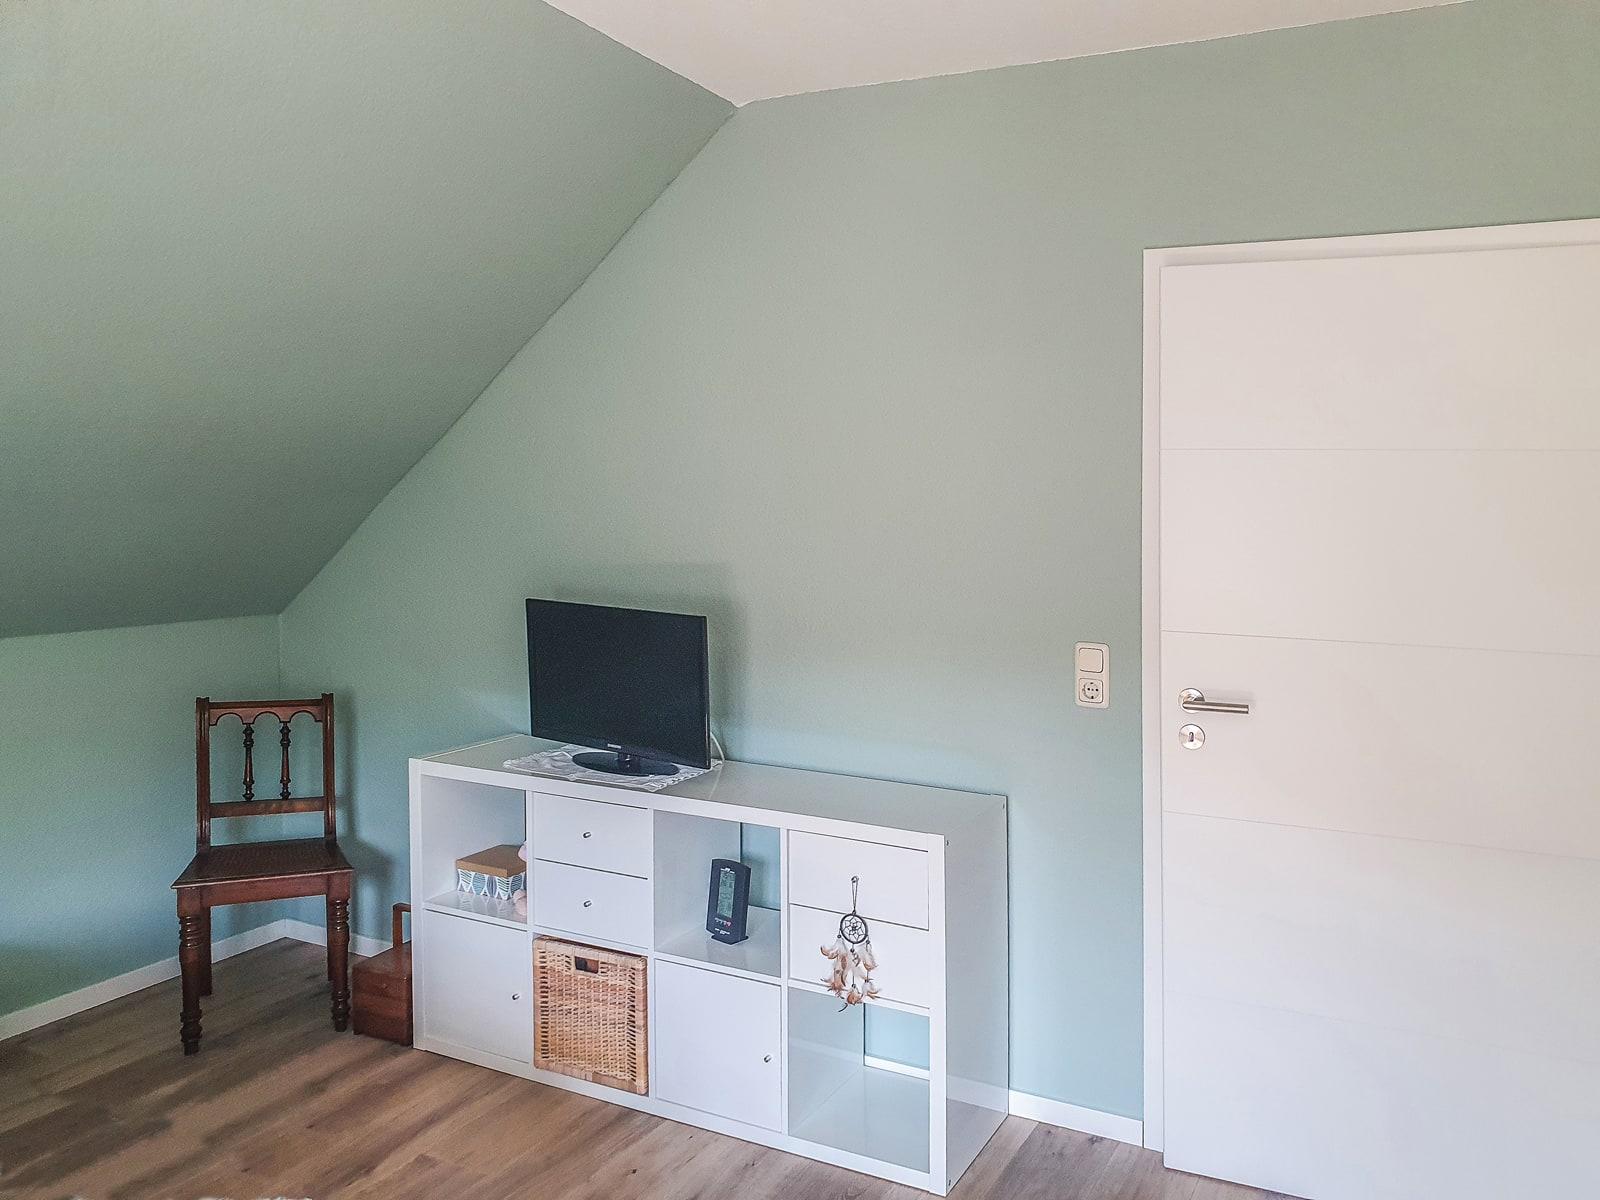 zementfliesen-terrazzofliesen-kreidefarbe-damastgruen-terrazzo-fugenlos-viaplatten | Kreidefarbe Damastgrün 60 ml